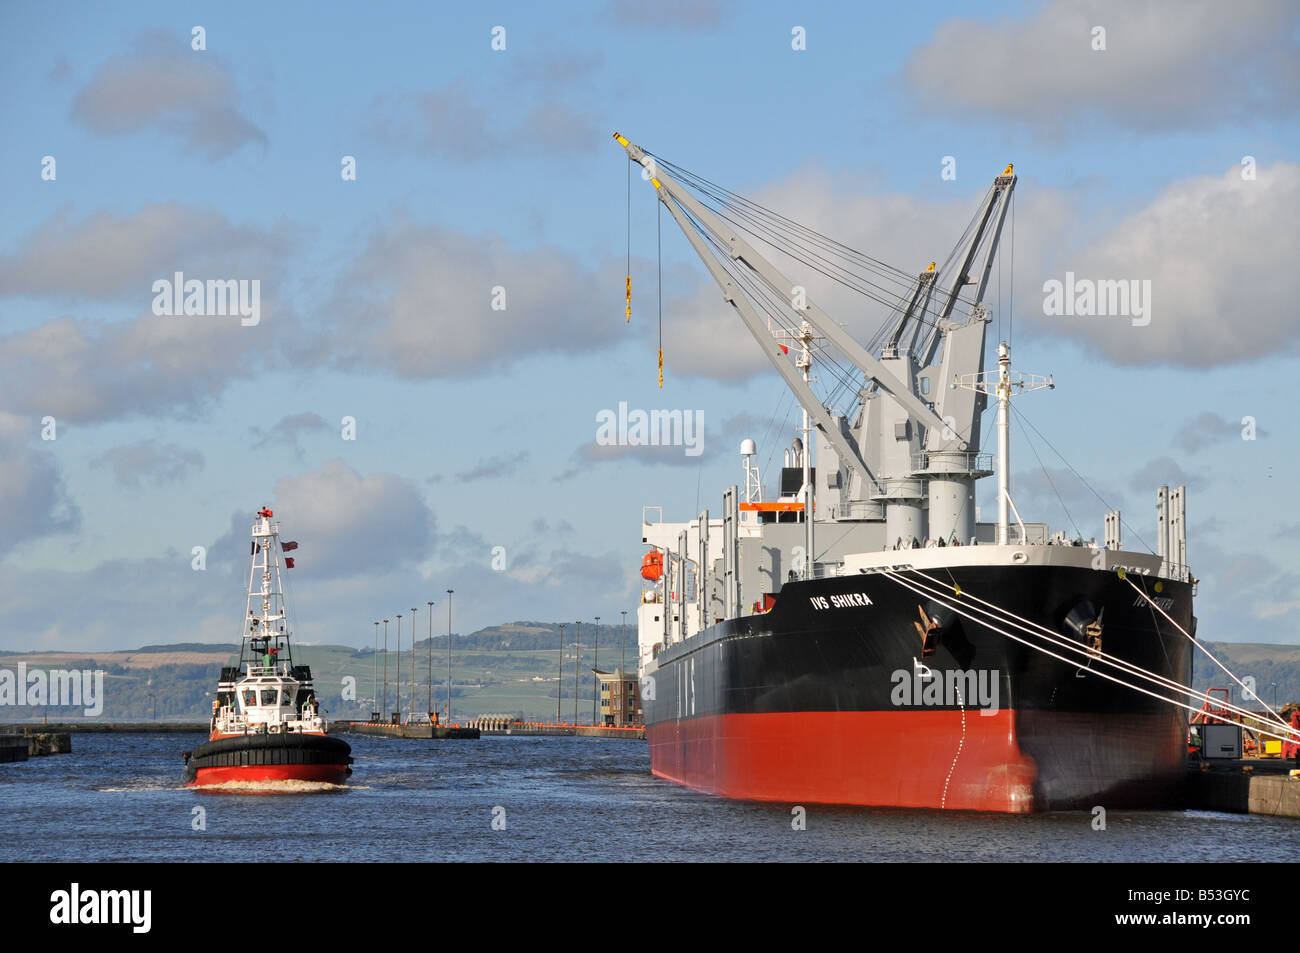 IVS Shikra bulk carrier ship - Stock Image